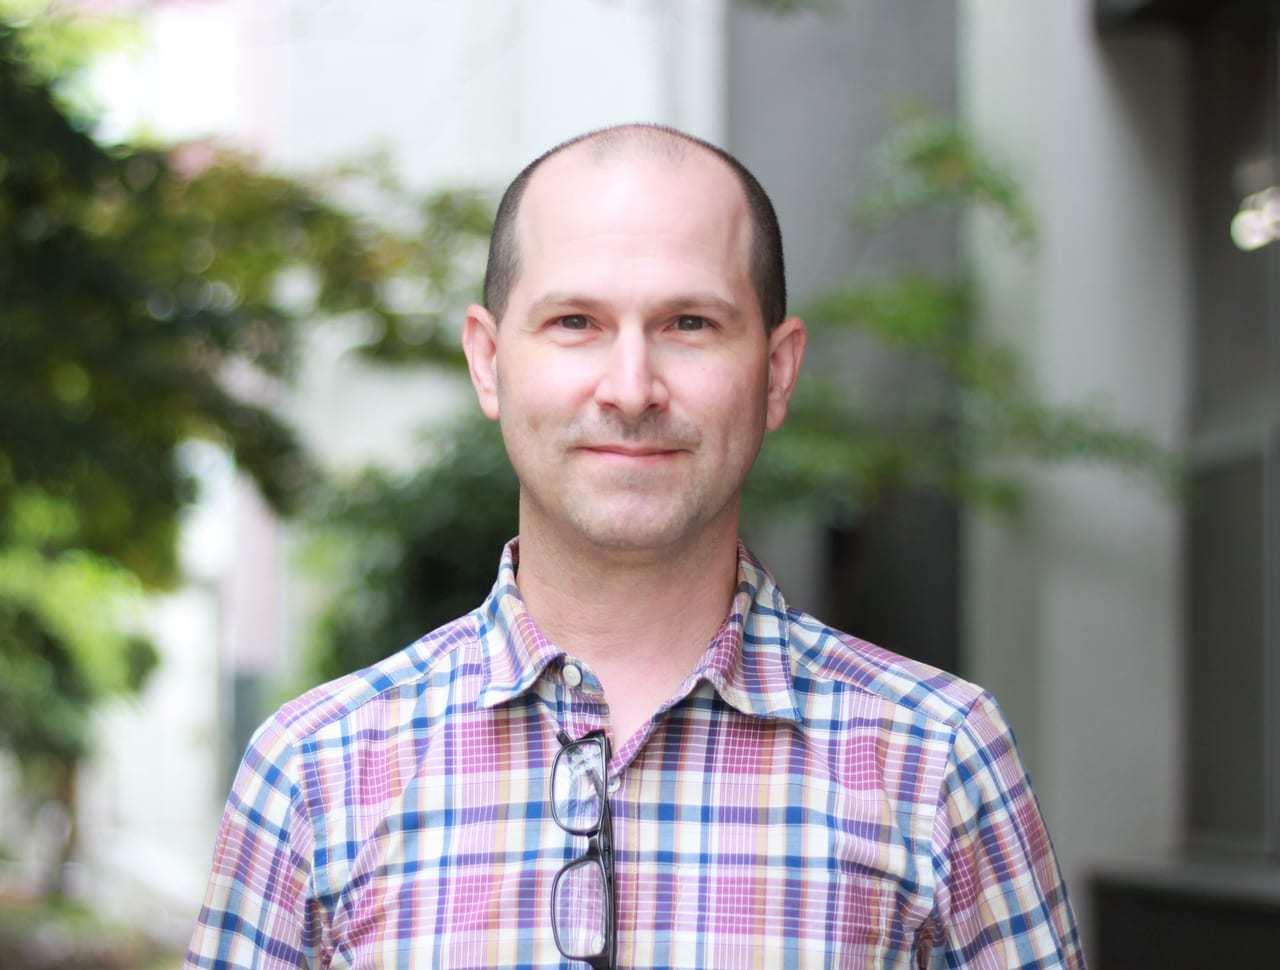 Steve Duex - English as an Additional Language (EAL) Programme Coordinator